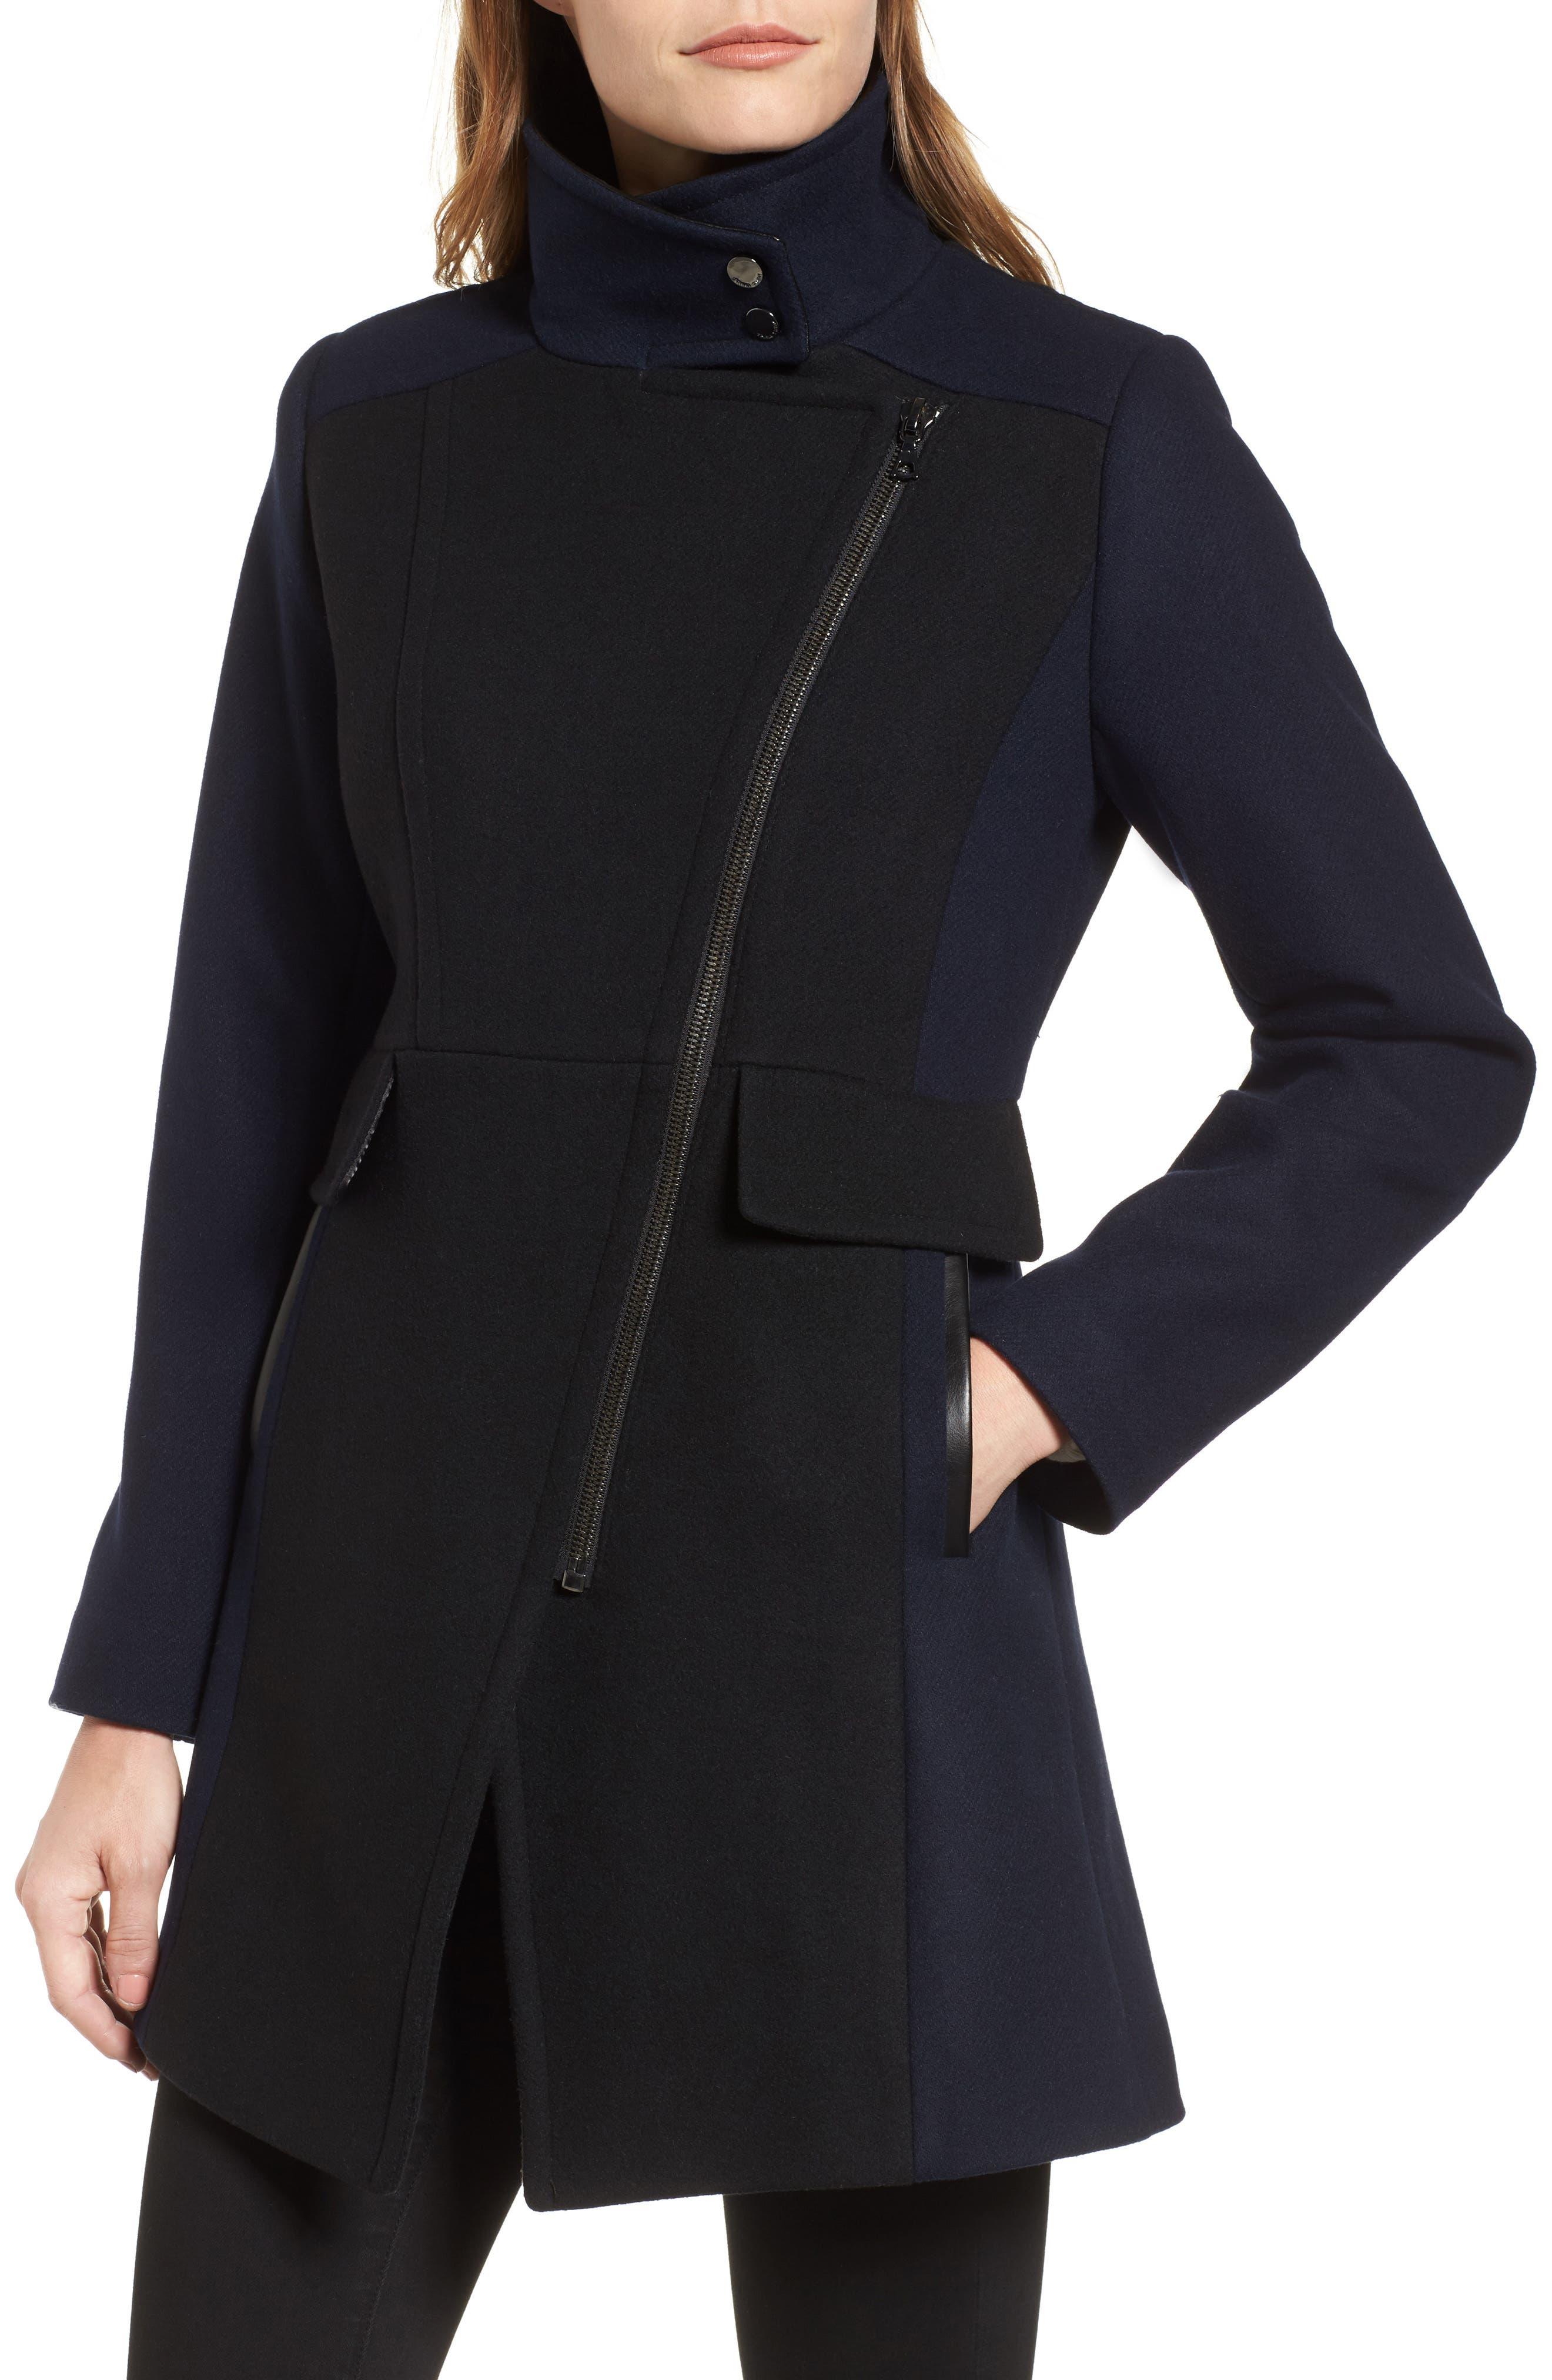 Eleanor Leather Trim Wool Blend Coat,                             Alternate thumbnail 4, color,                             002